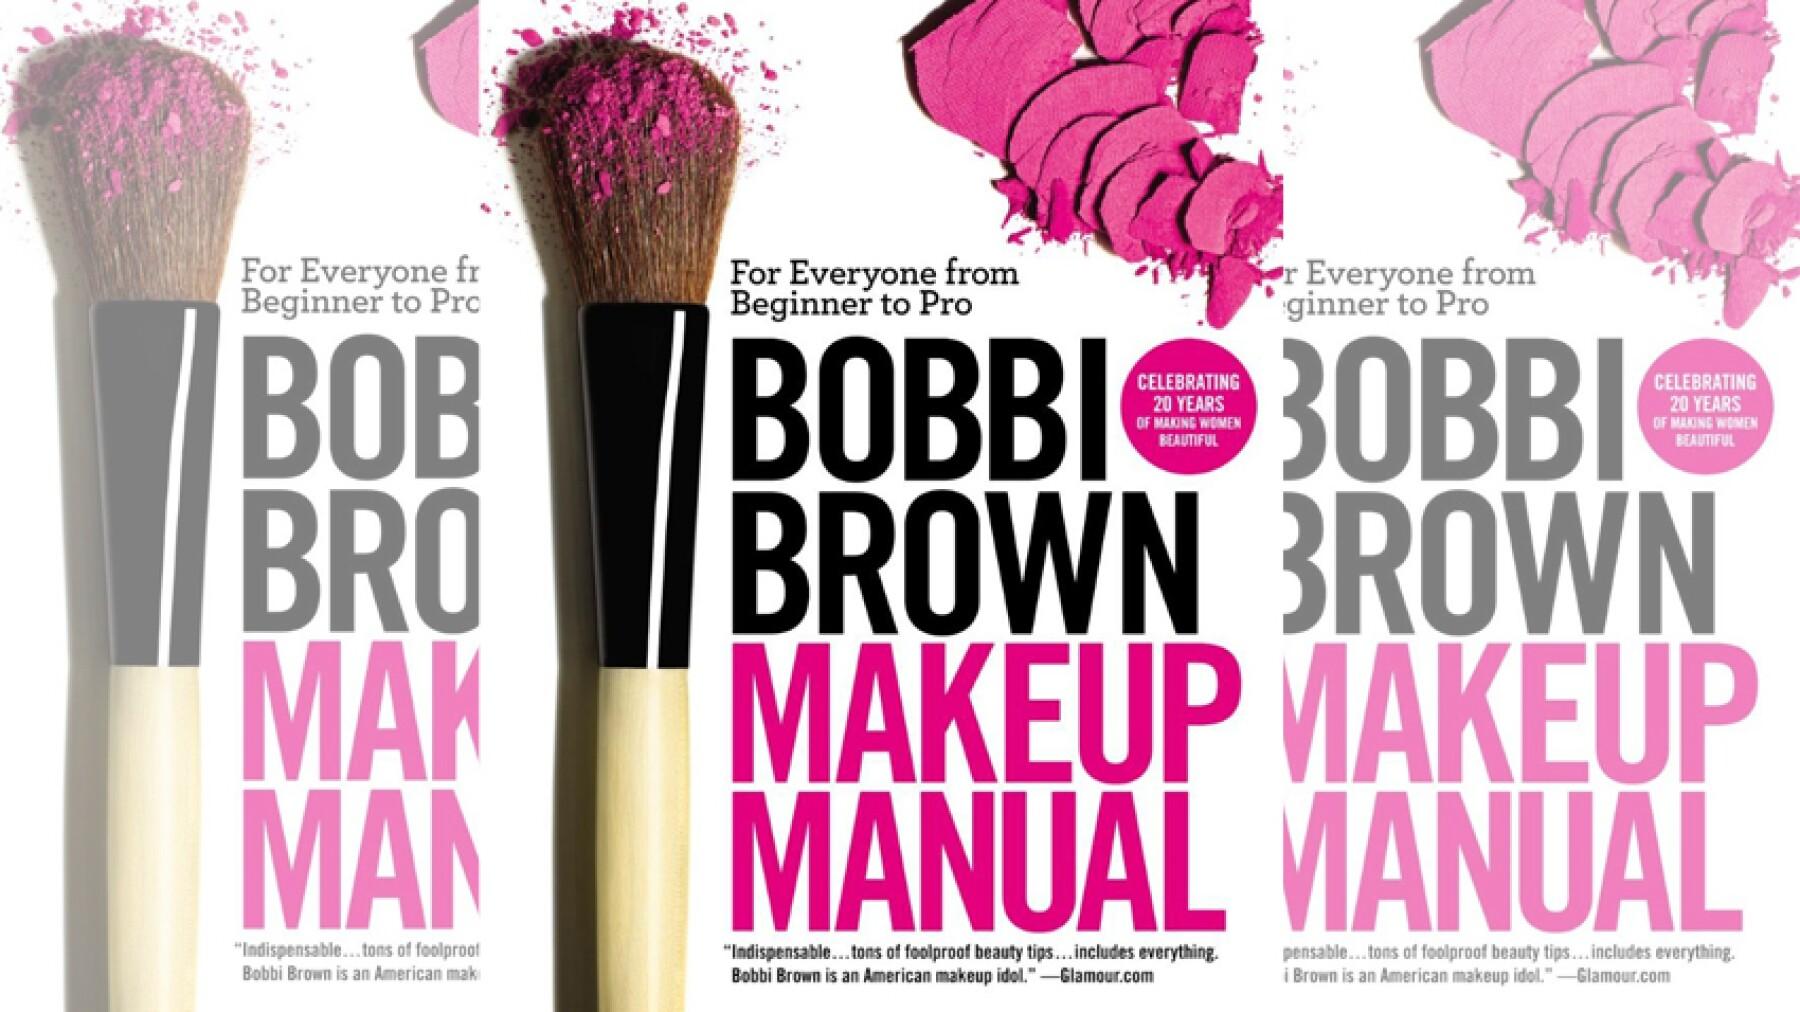 Makeup Manual de Bobbi Brown